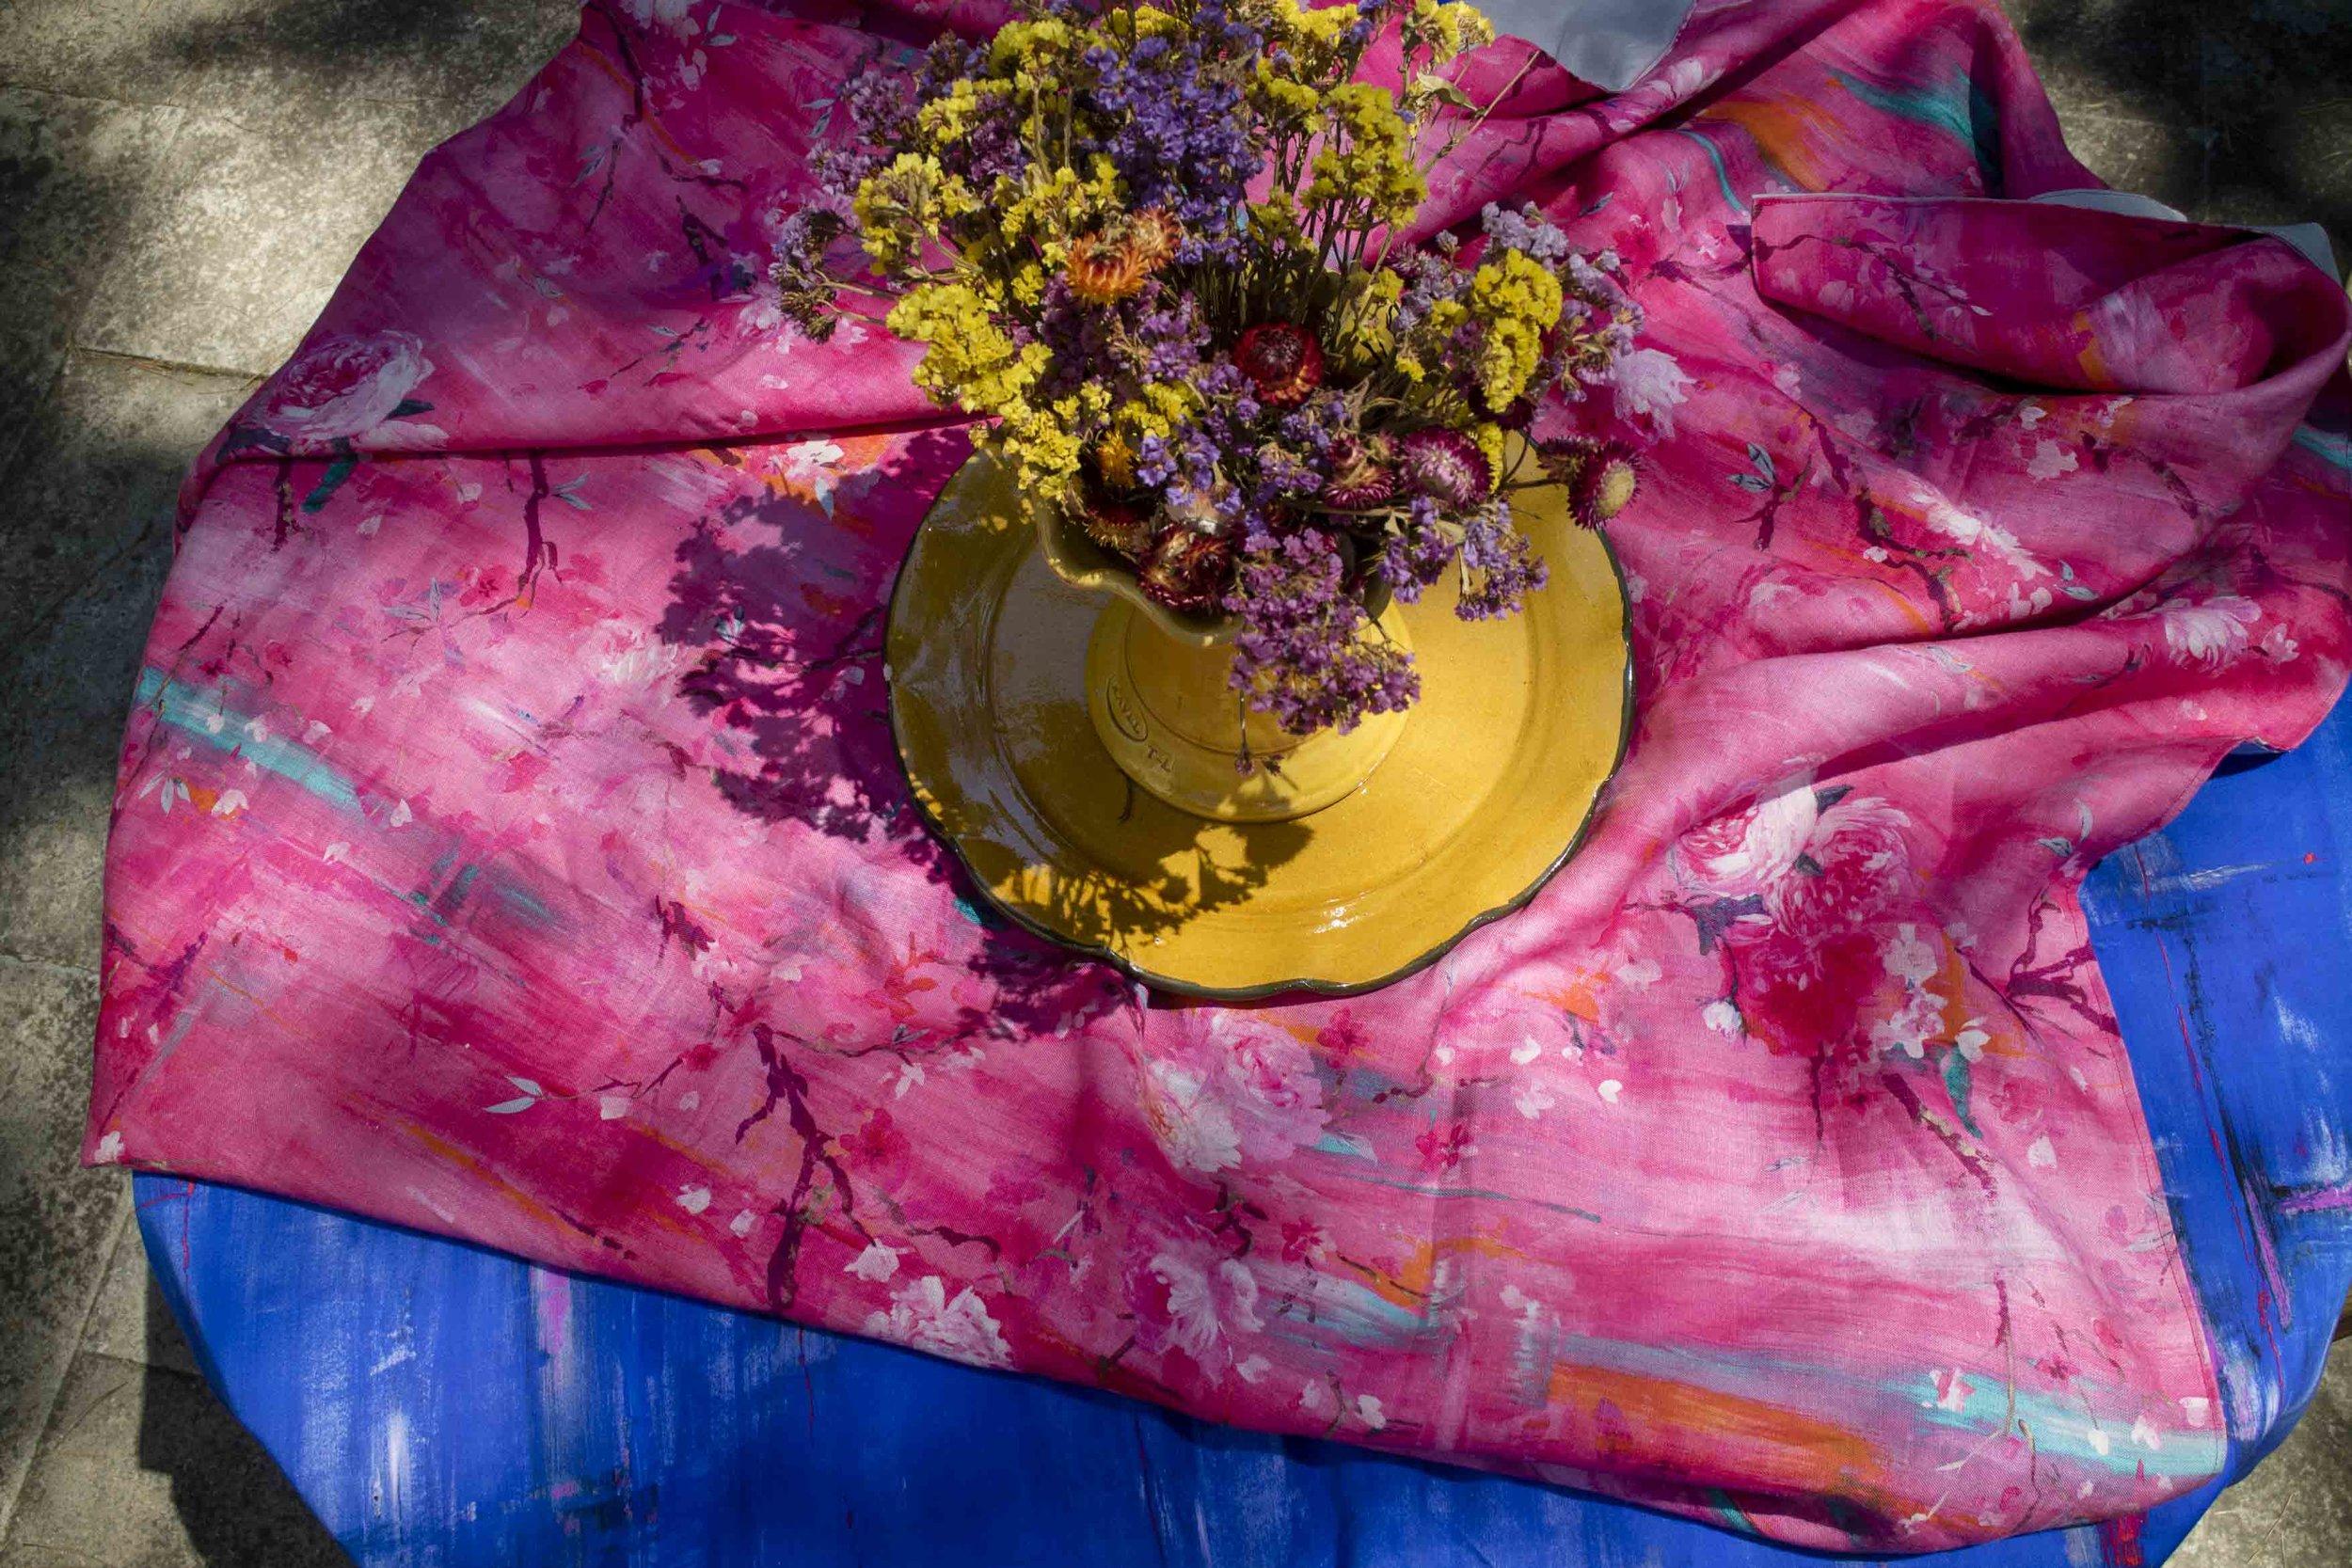 perfumes tablecloth4.JPG